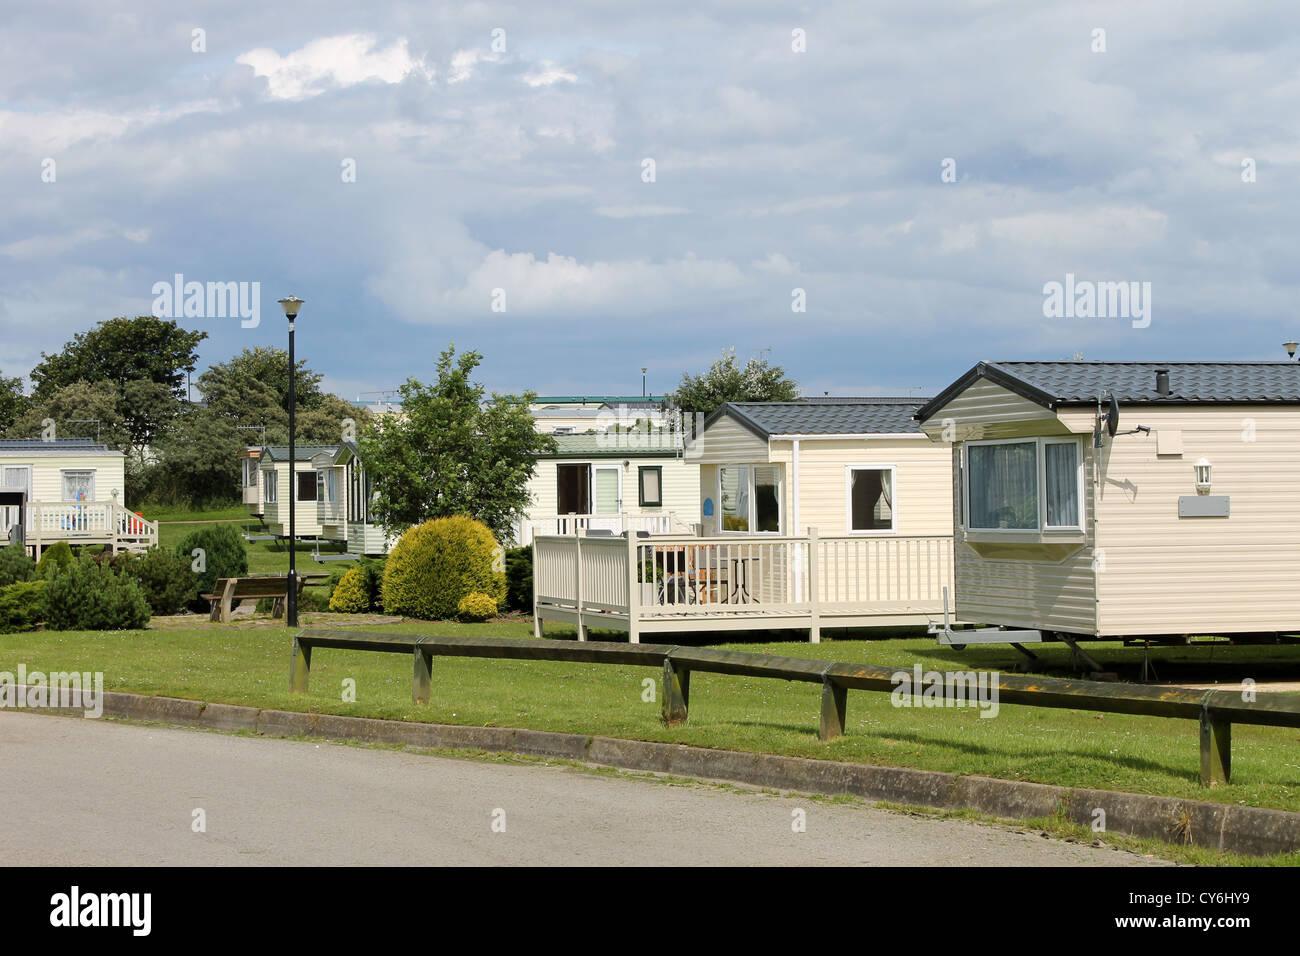 Holiday Caravan Park Accommodation England Stock Photos